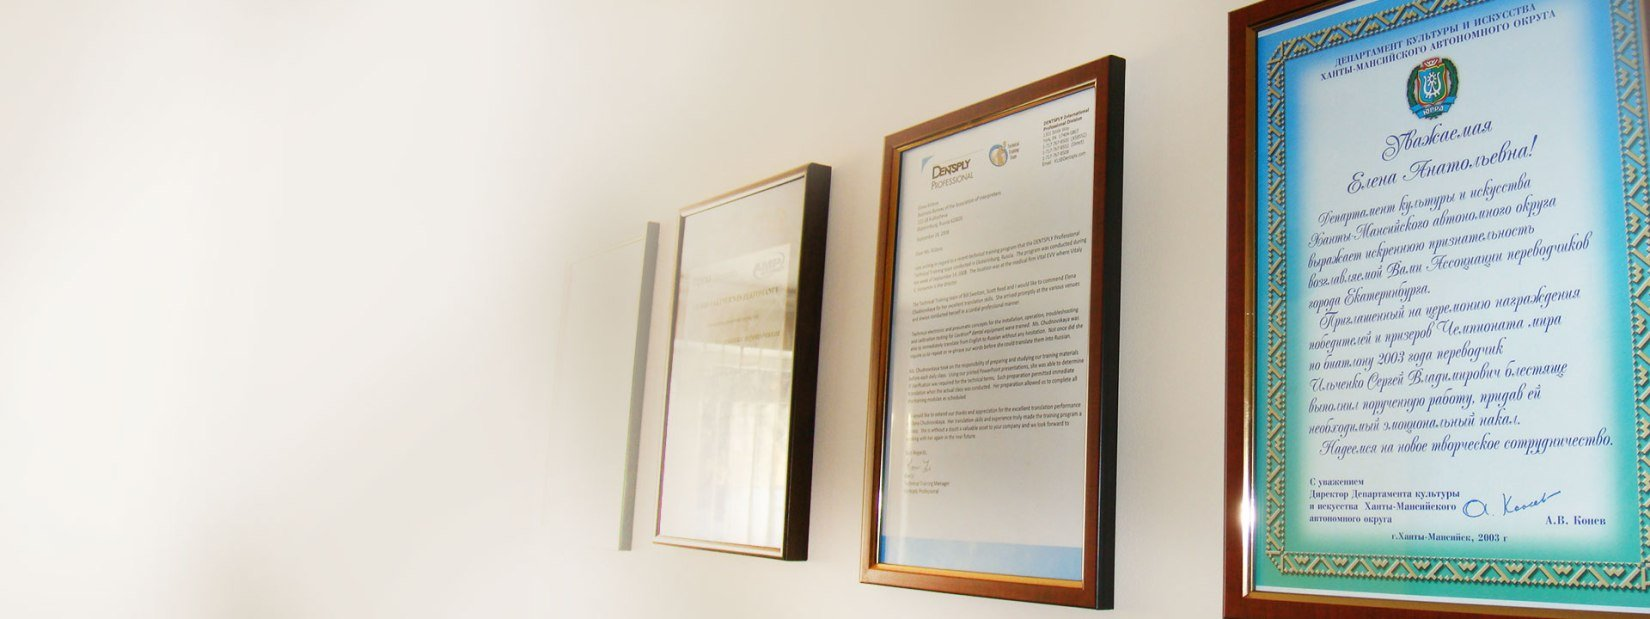 Рекомендации Бизнес-бюро Ассоциации переводчиков